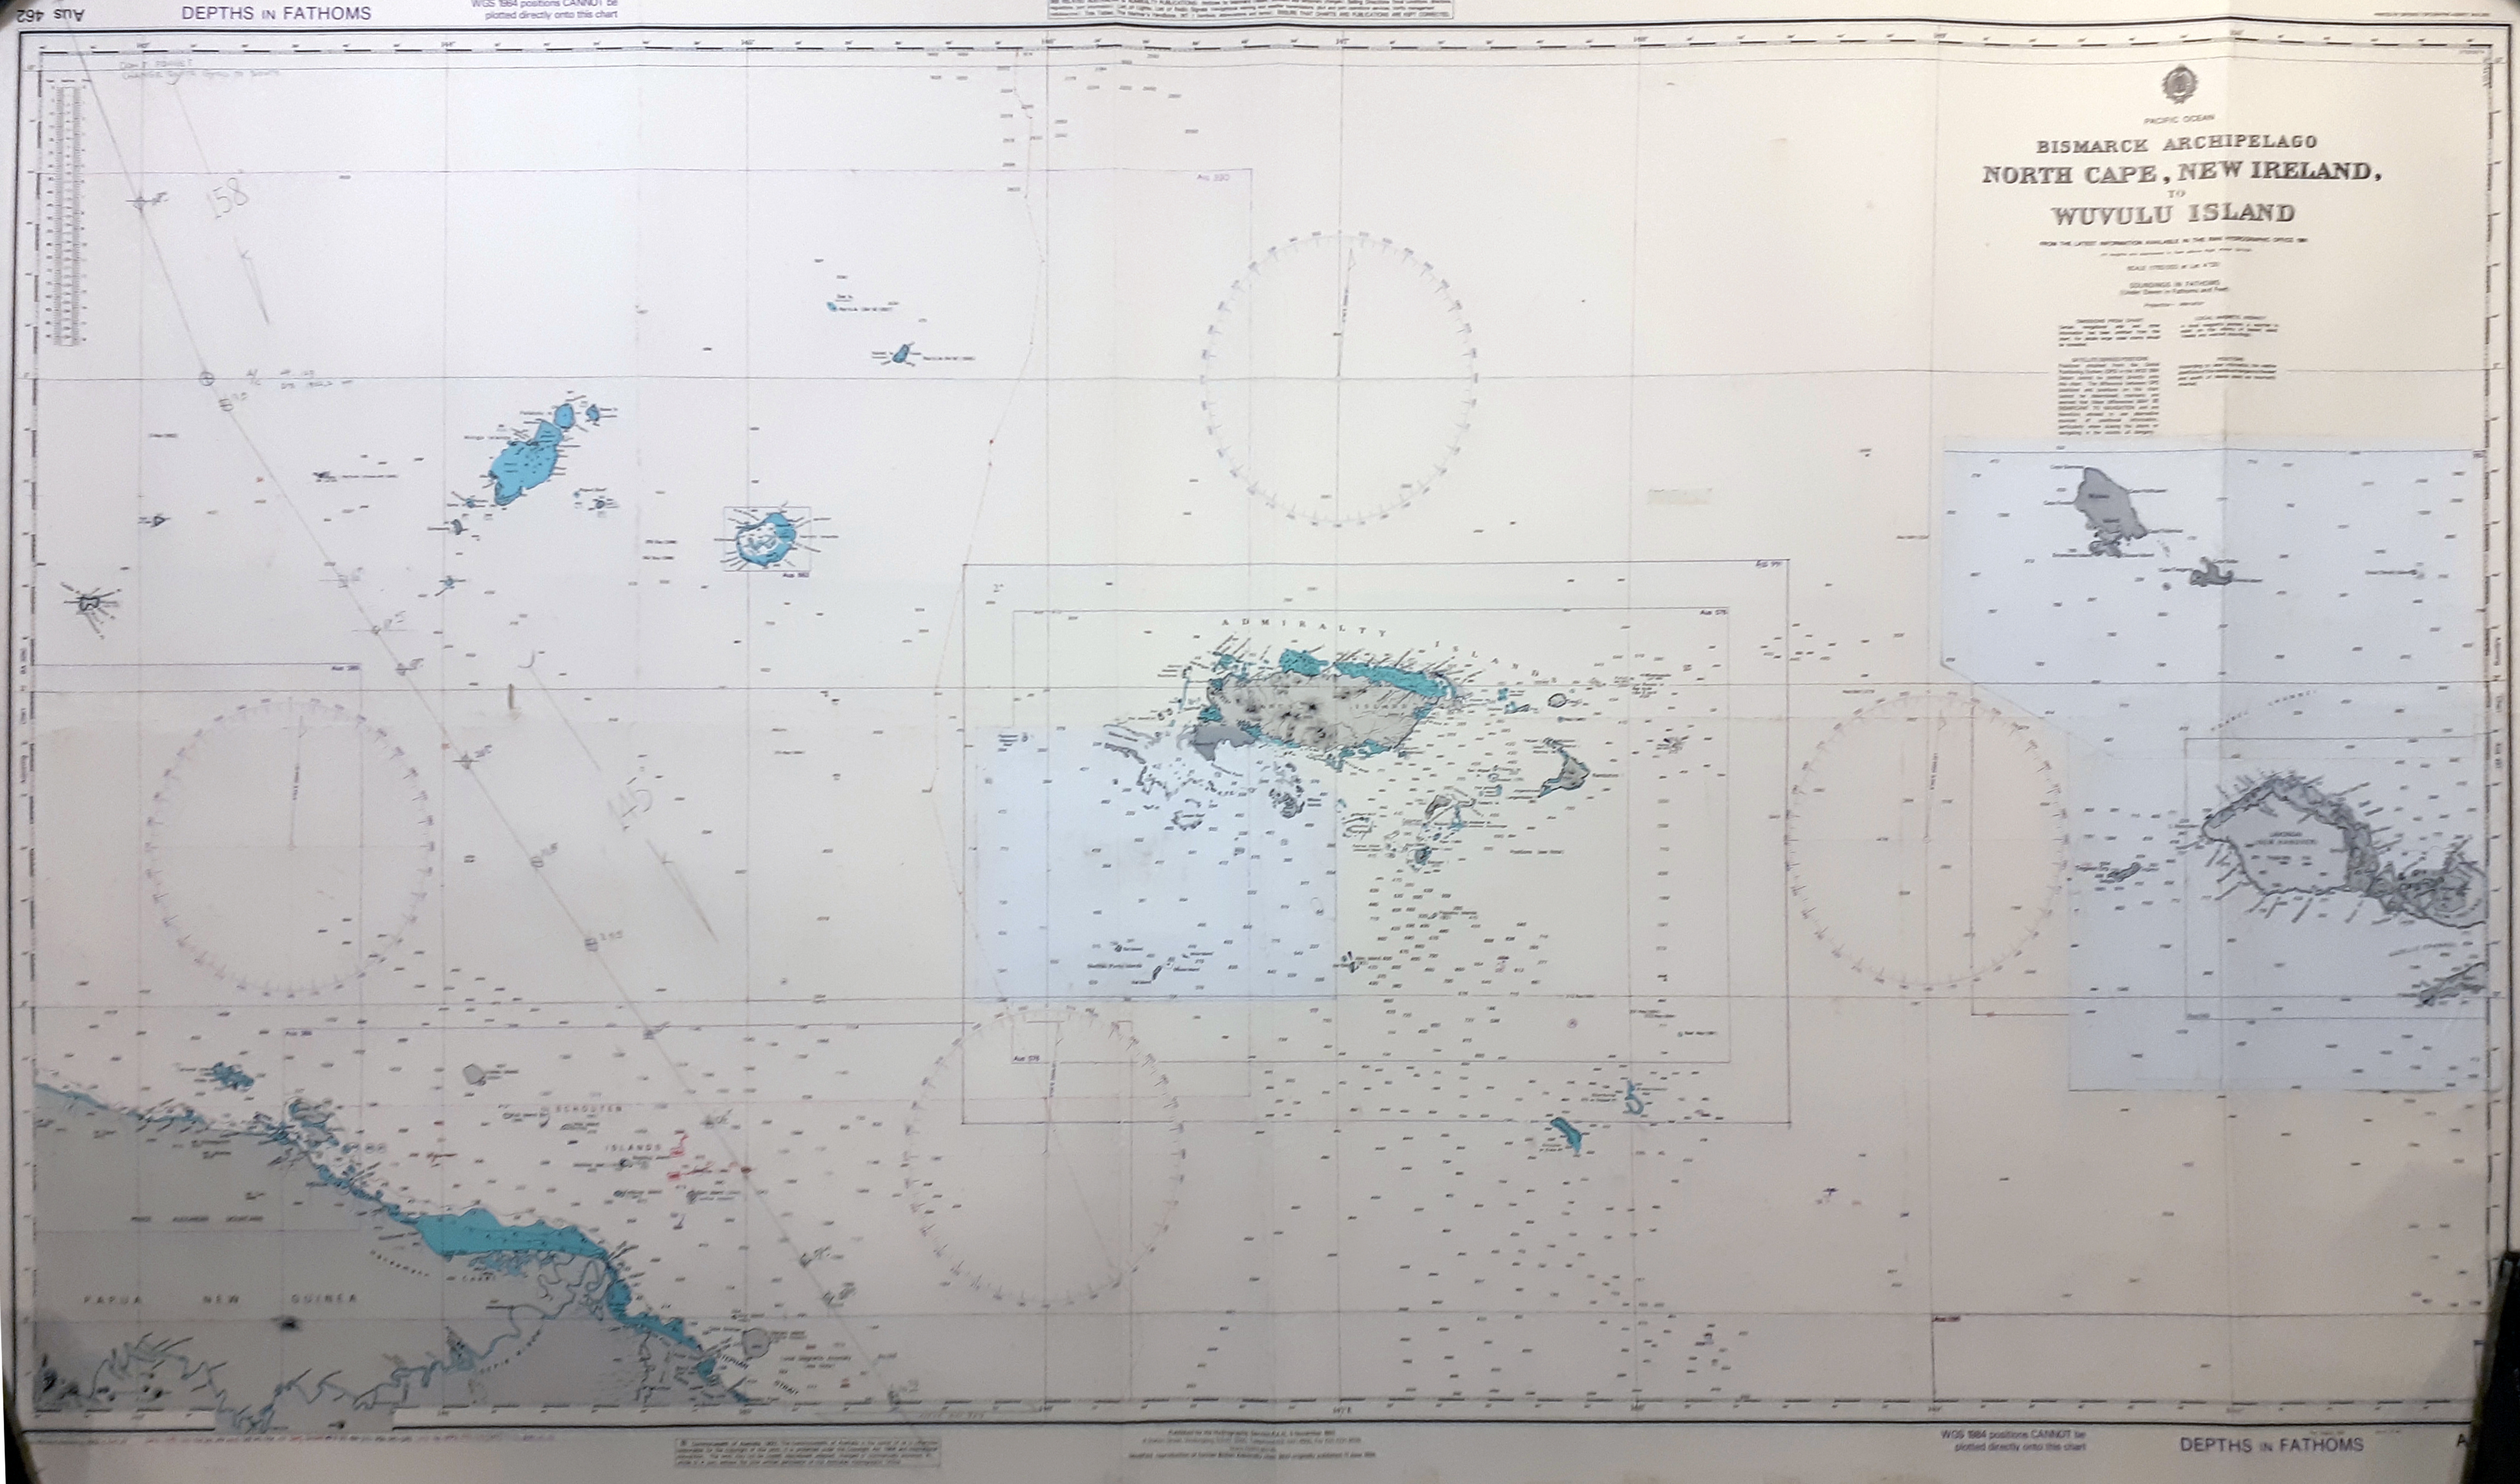 08. North Cape, New Ireland to Wuvulu Island